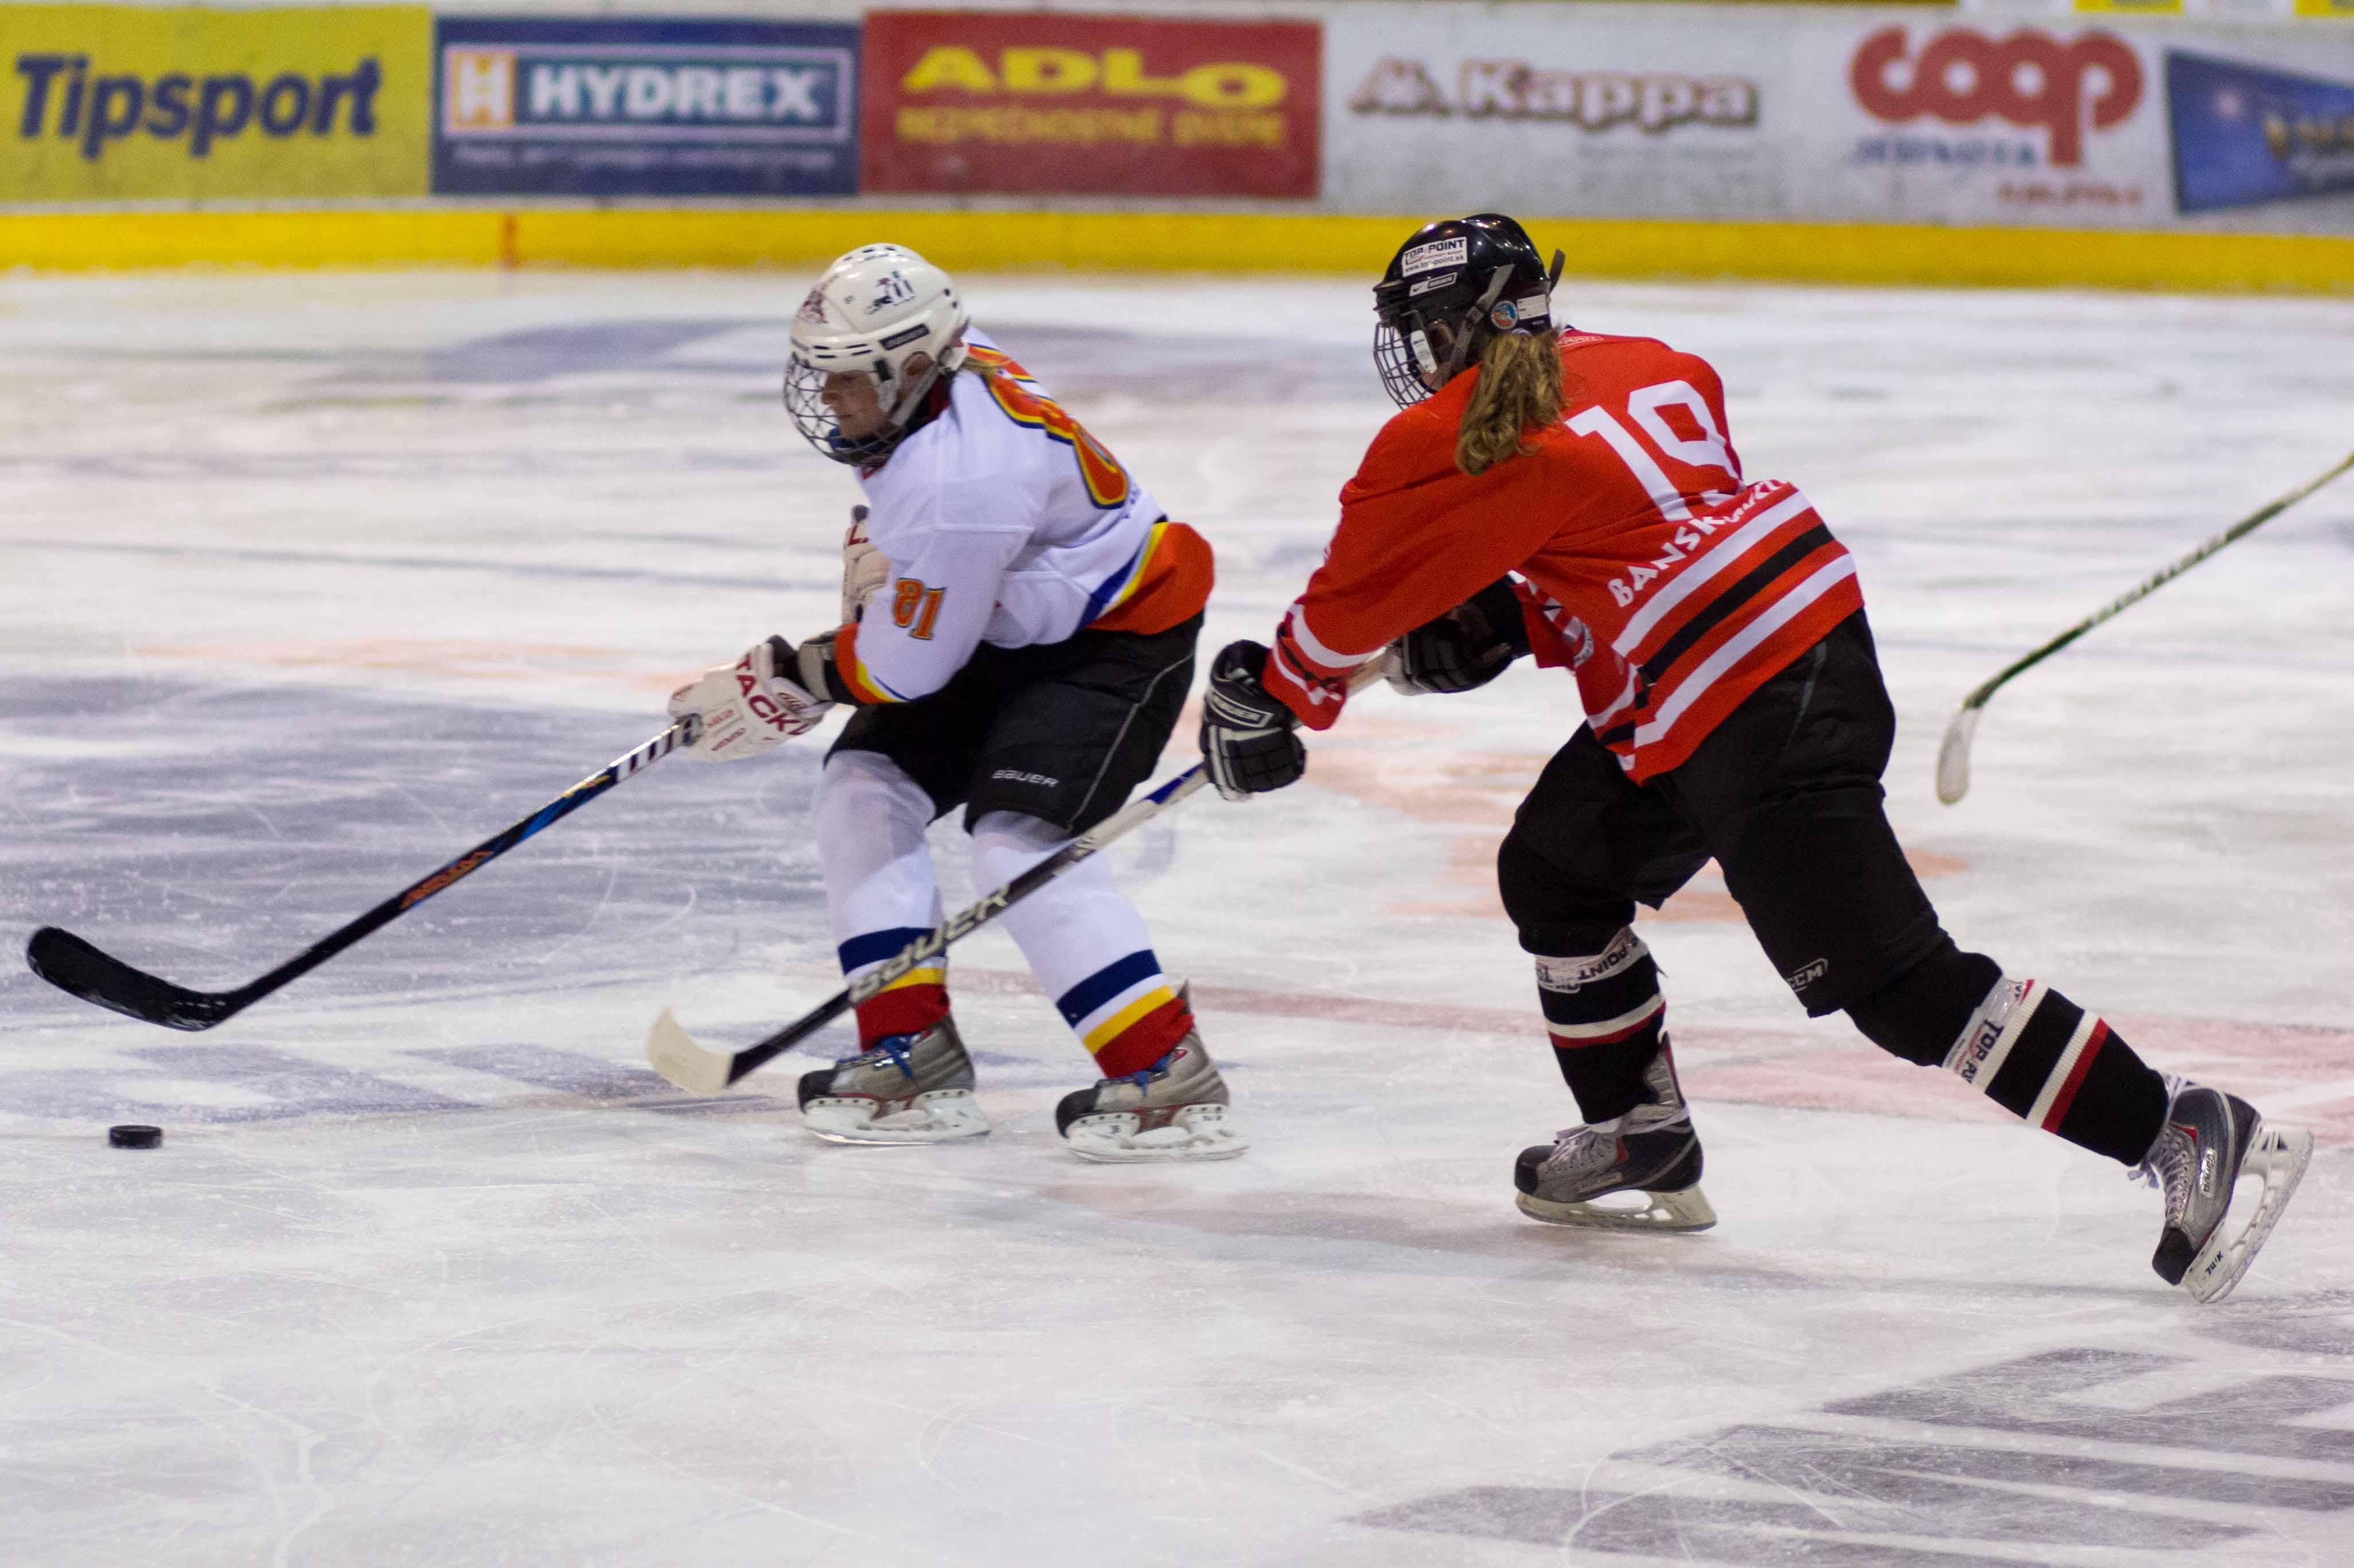 zhkm-zv-iskra-bb-2012-hokej-6